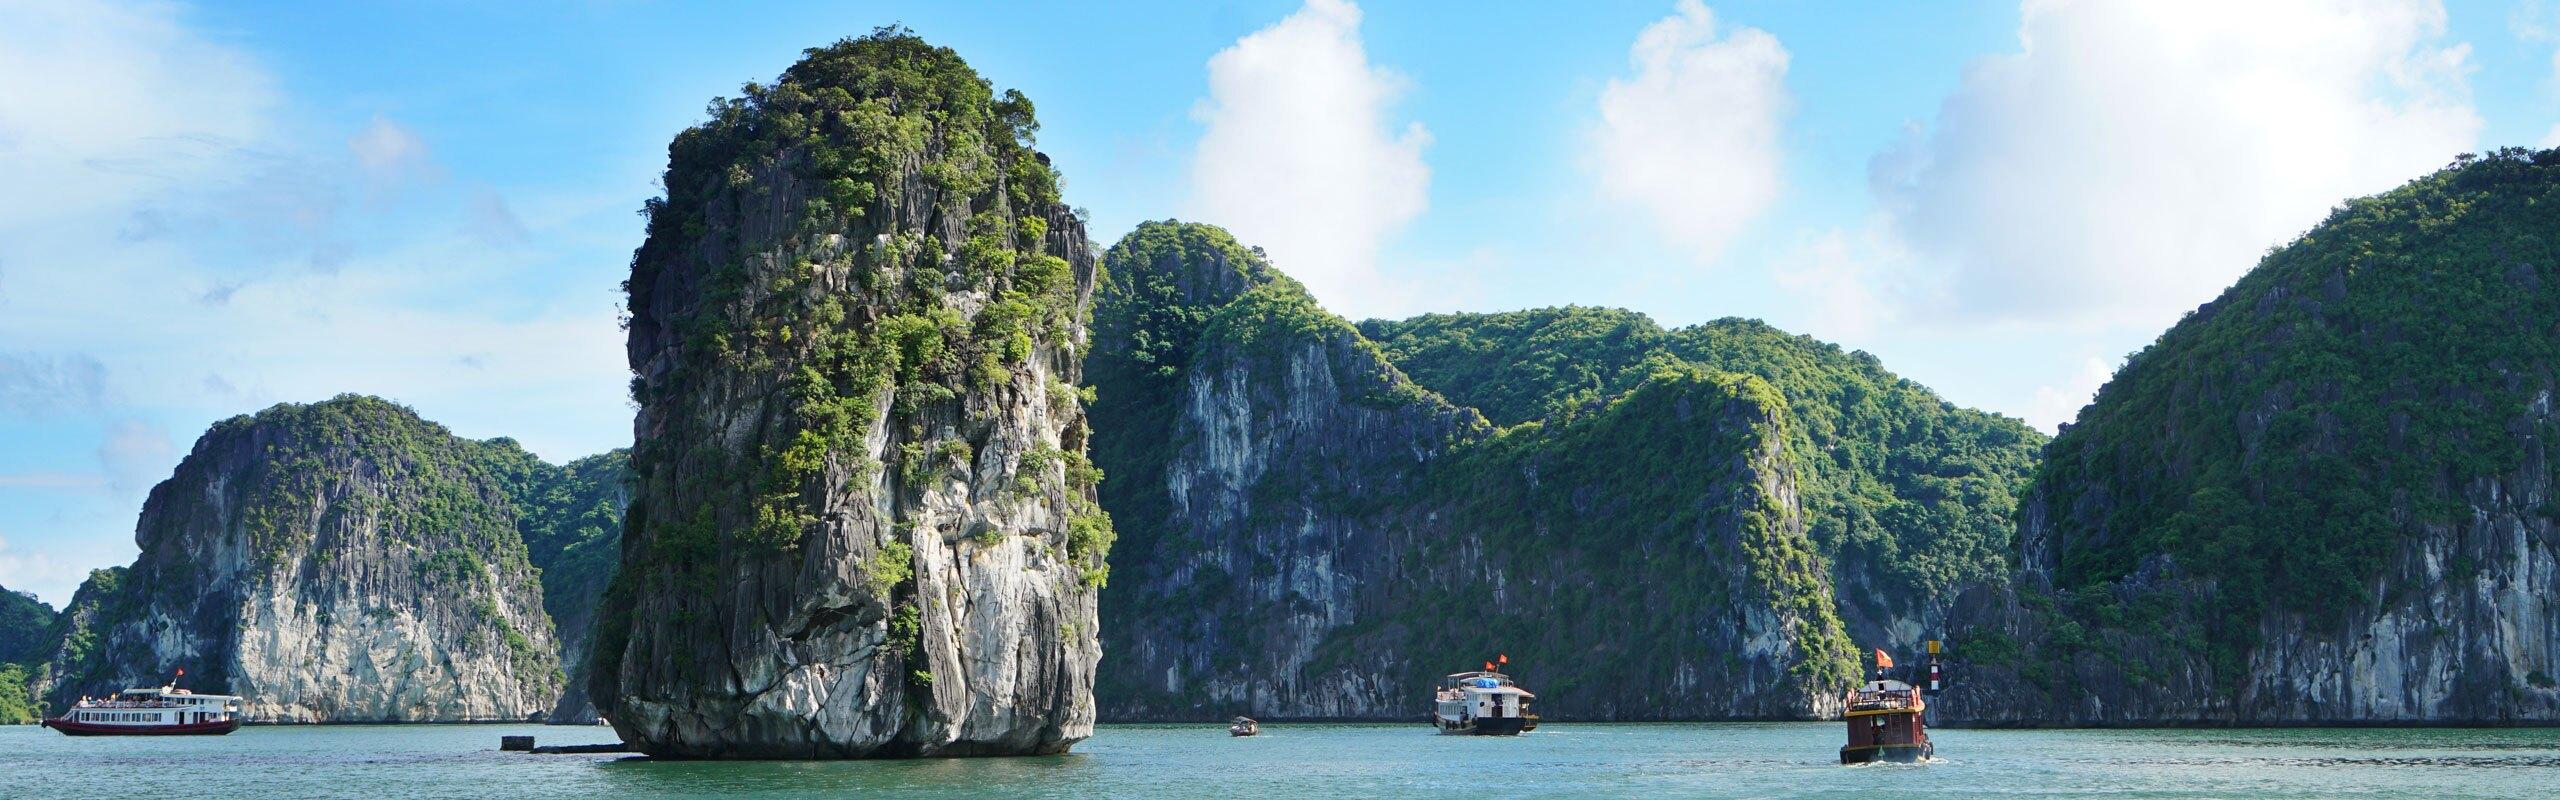 15-Day Vietnam Exploration with Beach Free Days